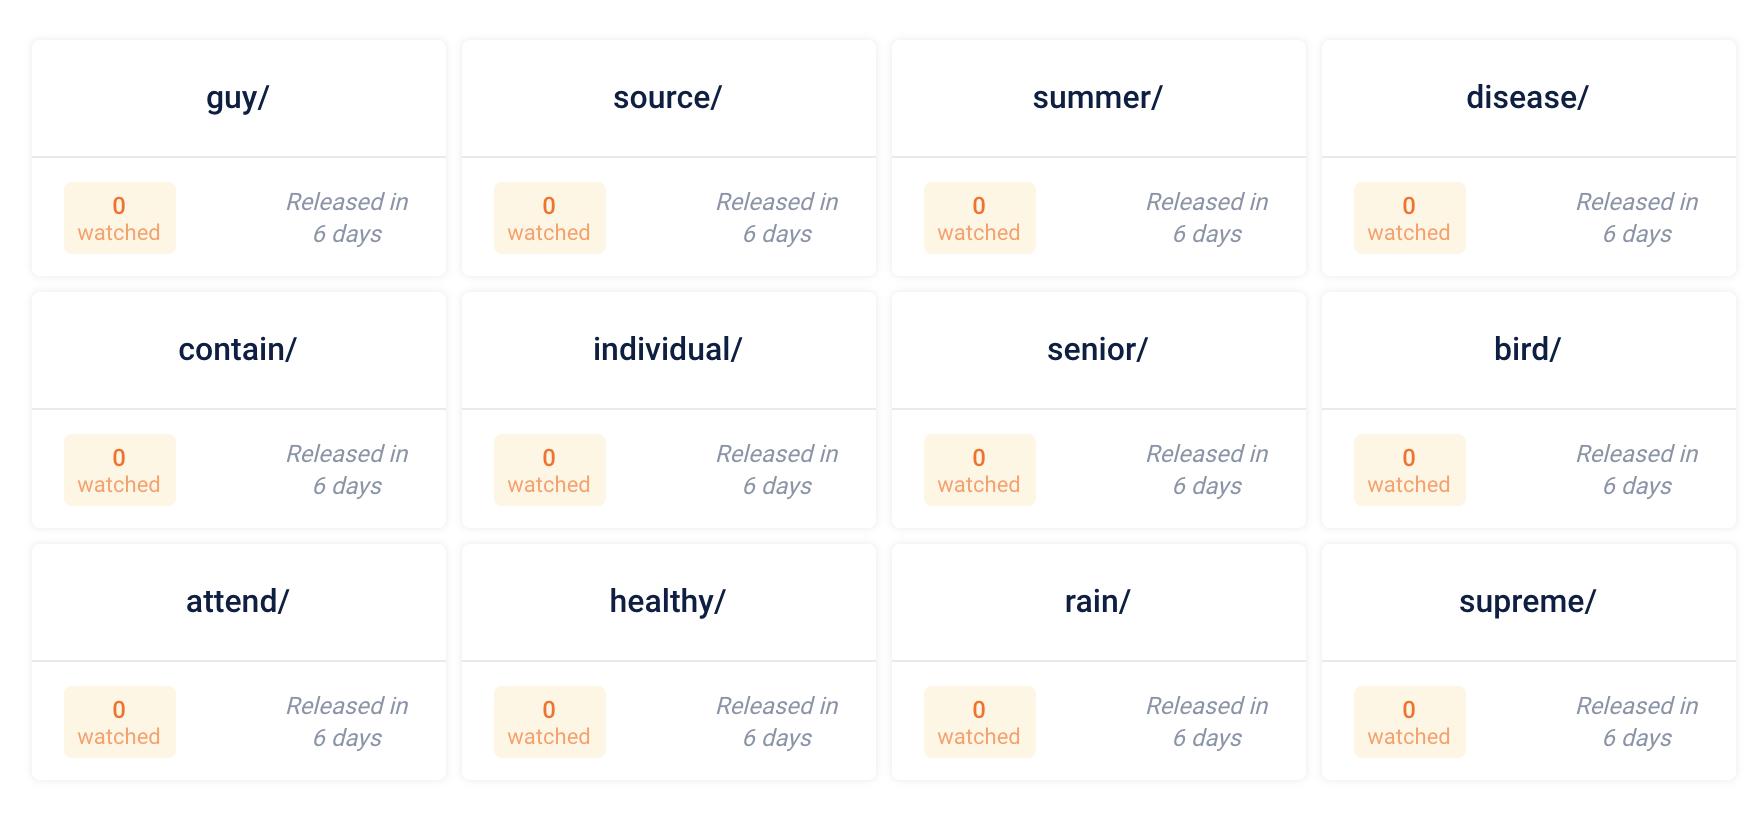 "La era de Dotcom de Crypto comienza cuando Handshake lanza dominios descentralizados"" width = ""1764"" height = ""816 ""srcset ="" https://blackswanfinances.com/wp-content/uploads/2020/02/screenshot-2020-02-05-at-16-06-00.png 1764w, https: //news.bitcoin .com / wp-content / uploads / 2020/02 / screenshot-2020-02-05-at-16-06-00-300x139.png 300w, https://news.bitcoin.com/wp-content/uploads/ 2020/02 / screenshot-2020-02-05-at-16-06-00-1024x474.png 1024w, https://news.bitcoin.com/wp-content/uploads/2020/02/screenshot-2020-02 -05-at-16-06-00-768x355.png 768w, https://news.bitcoin.com/wp-content/uploads/2020/02/screenshot-2020-02-05-at-16-06- 00-1536x711.png 1536w, https://news.bitcoin.com/wp-content/uploads/2020/02/screenshot-2020-02-05-at-16-06-00-696x322.png 696w, https: //news.bitcoin.com/wp-content/uploads/2020/02/screenshot-2020-02-05-at-16-06-00-1392x644.png 1392w, https://news.bitcoin.co m / wp-content / uploads / 2020/02 / screenshot-2020-02-05-at-16-06-00-1068x494.png 1068w, https://news.bitcoin.com/wp-content/uploads/2020 /02/screenshot-2020-02-05-at-16-06-00-908x420.png 908w ""tamaños ="" (ancho máximo: 1764px) 100vw, 1764px"